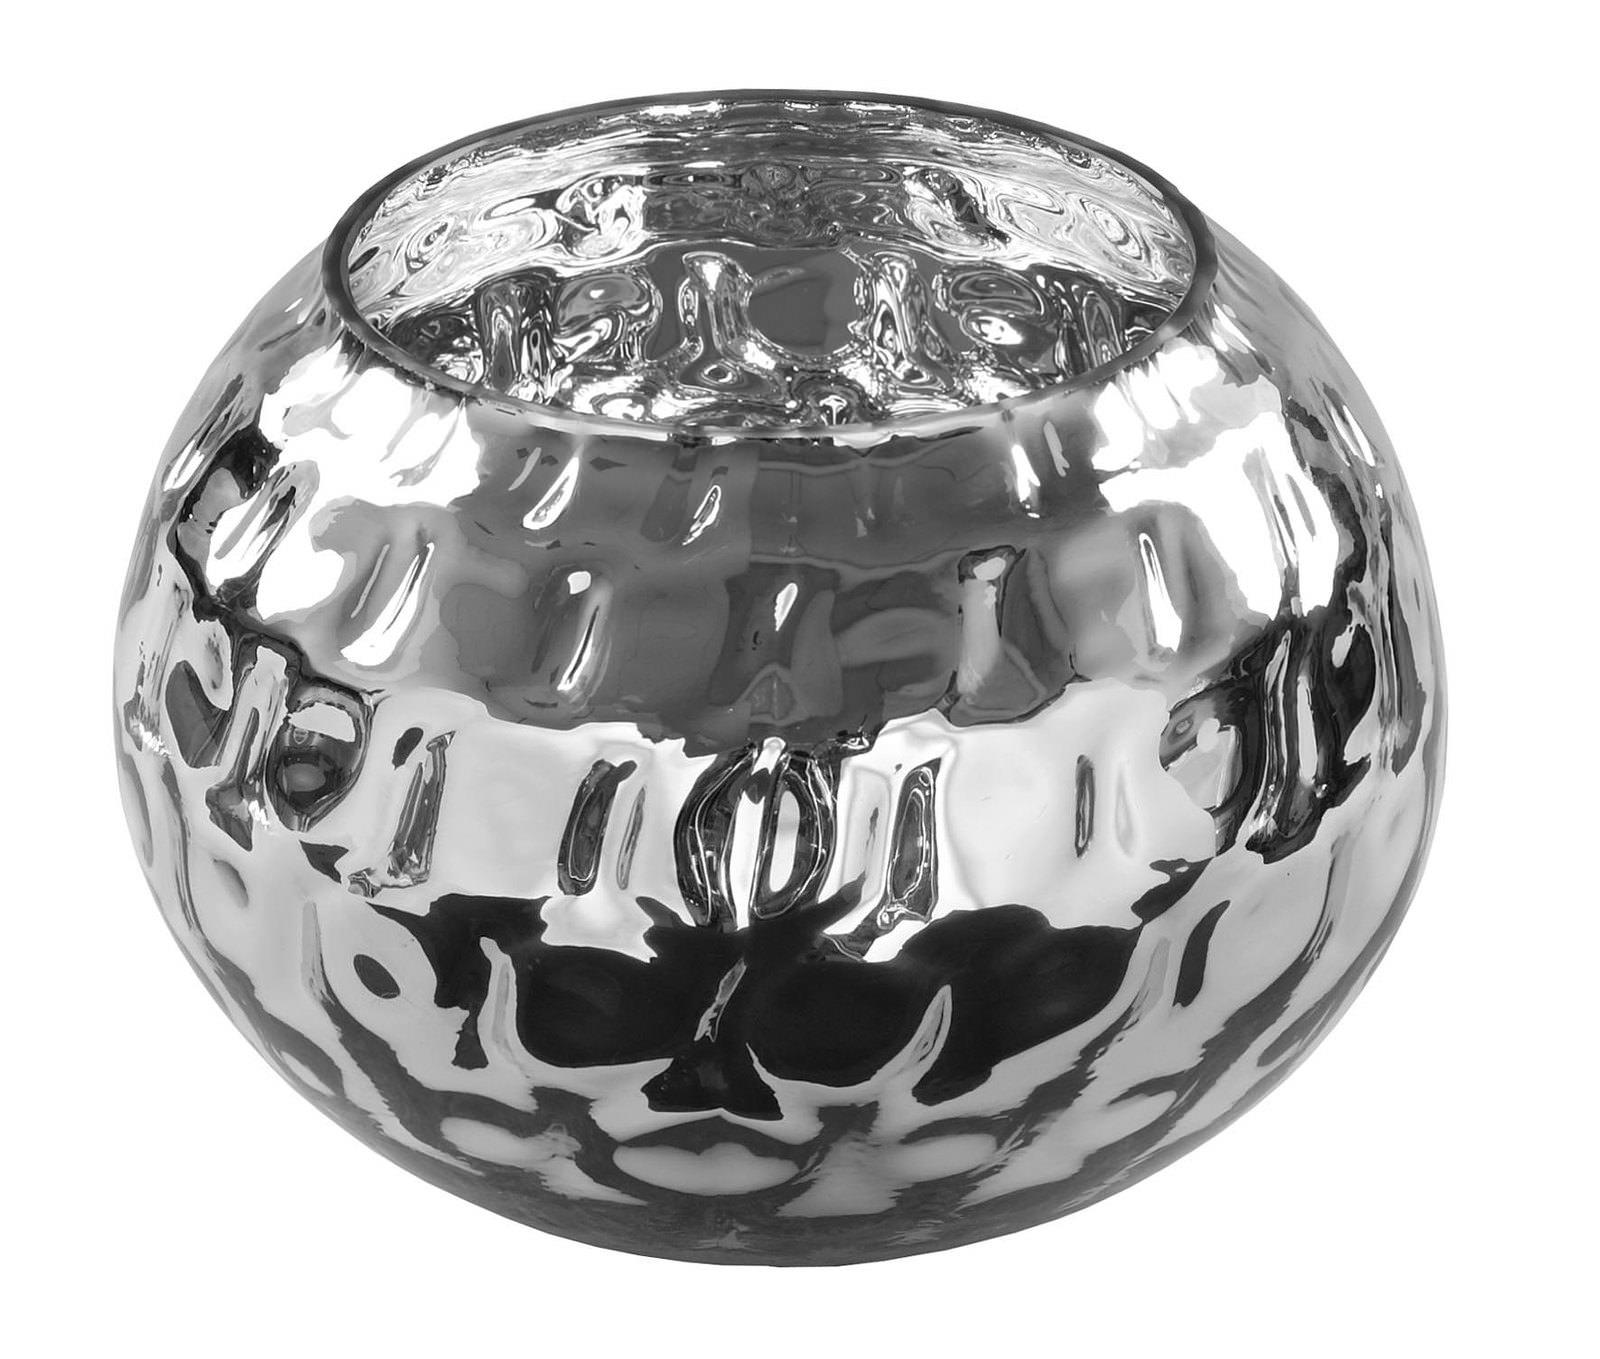 fink glas kugelvase online entdecken knuffmann ihr m belhaus. Black Bedroom Furniture Sets. Home Design Ideas